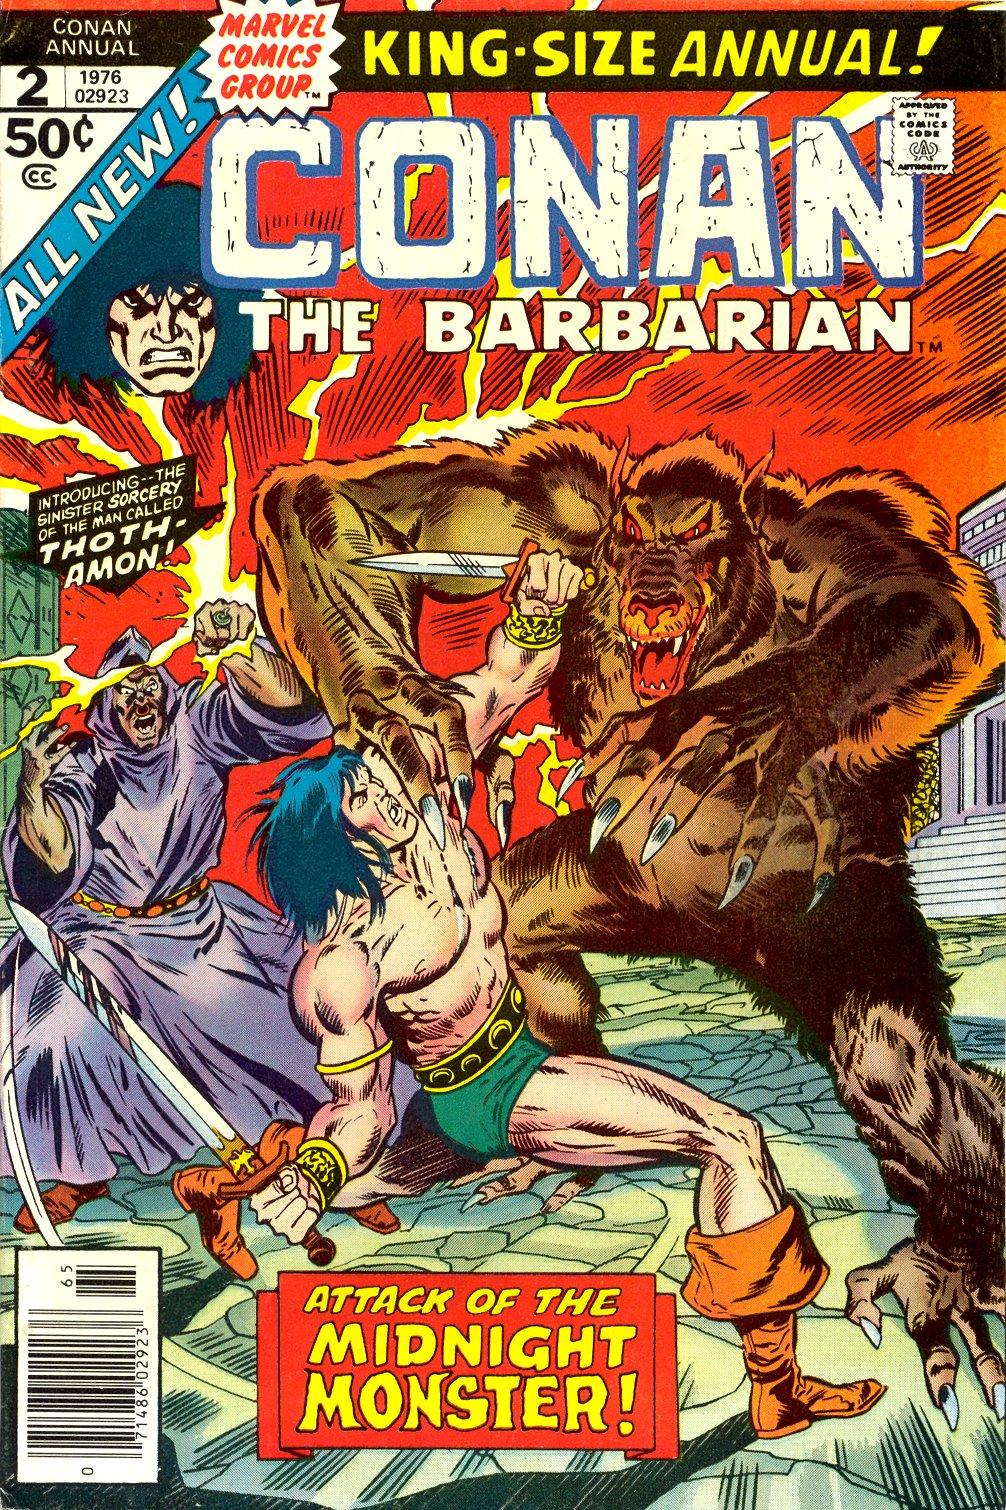 Conan the Barbarian Annual Vol 1 2